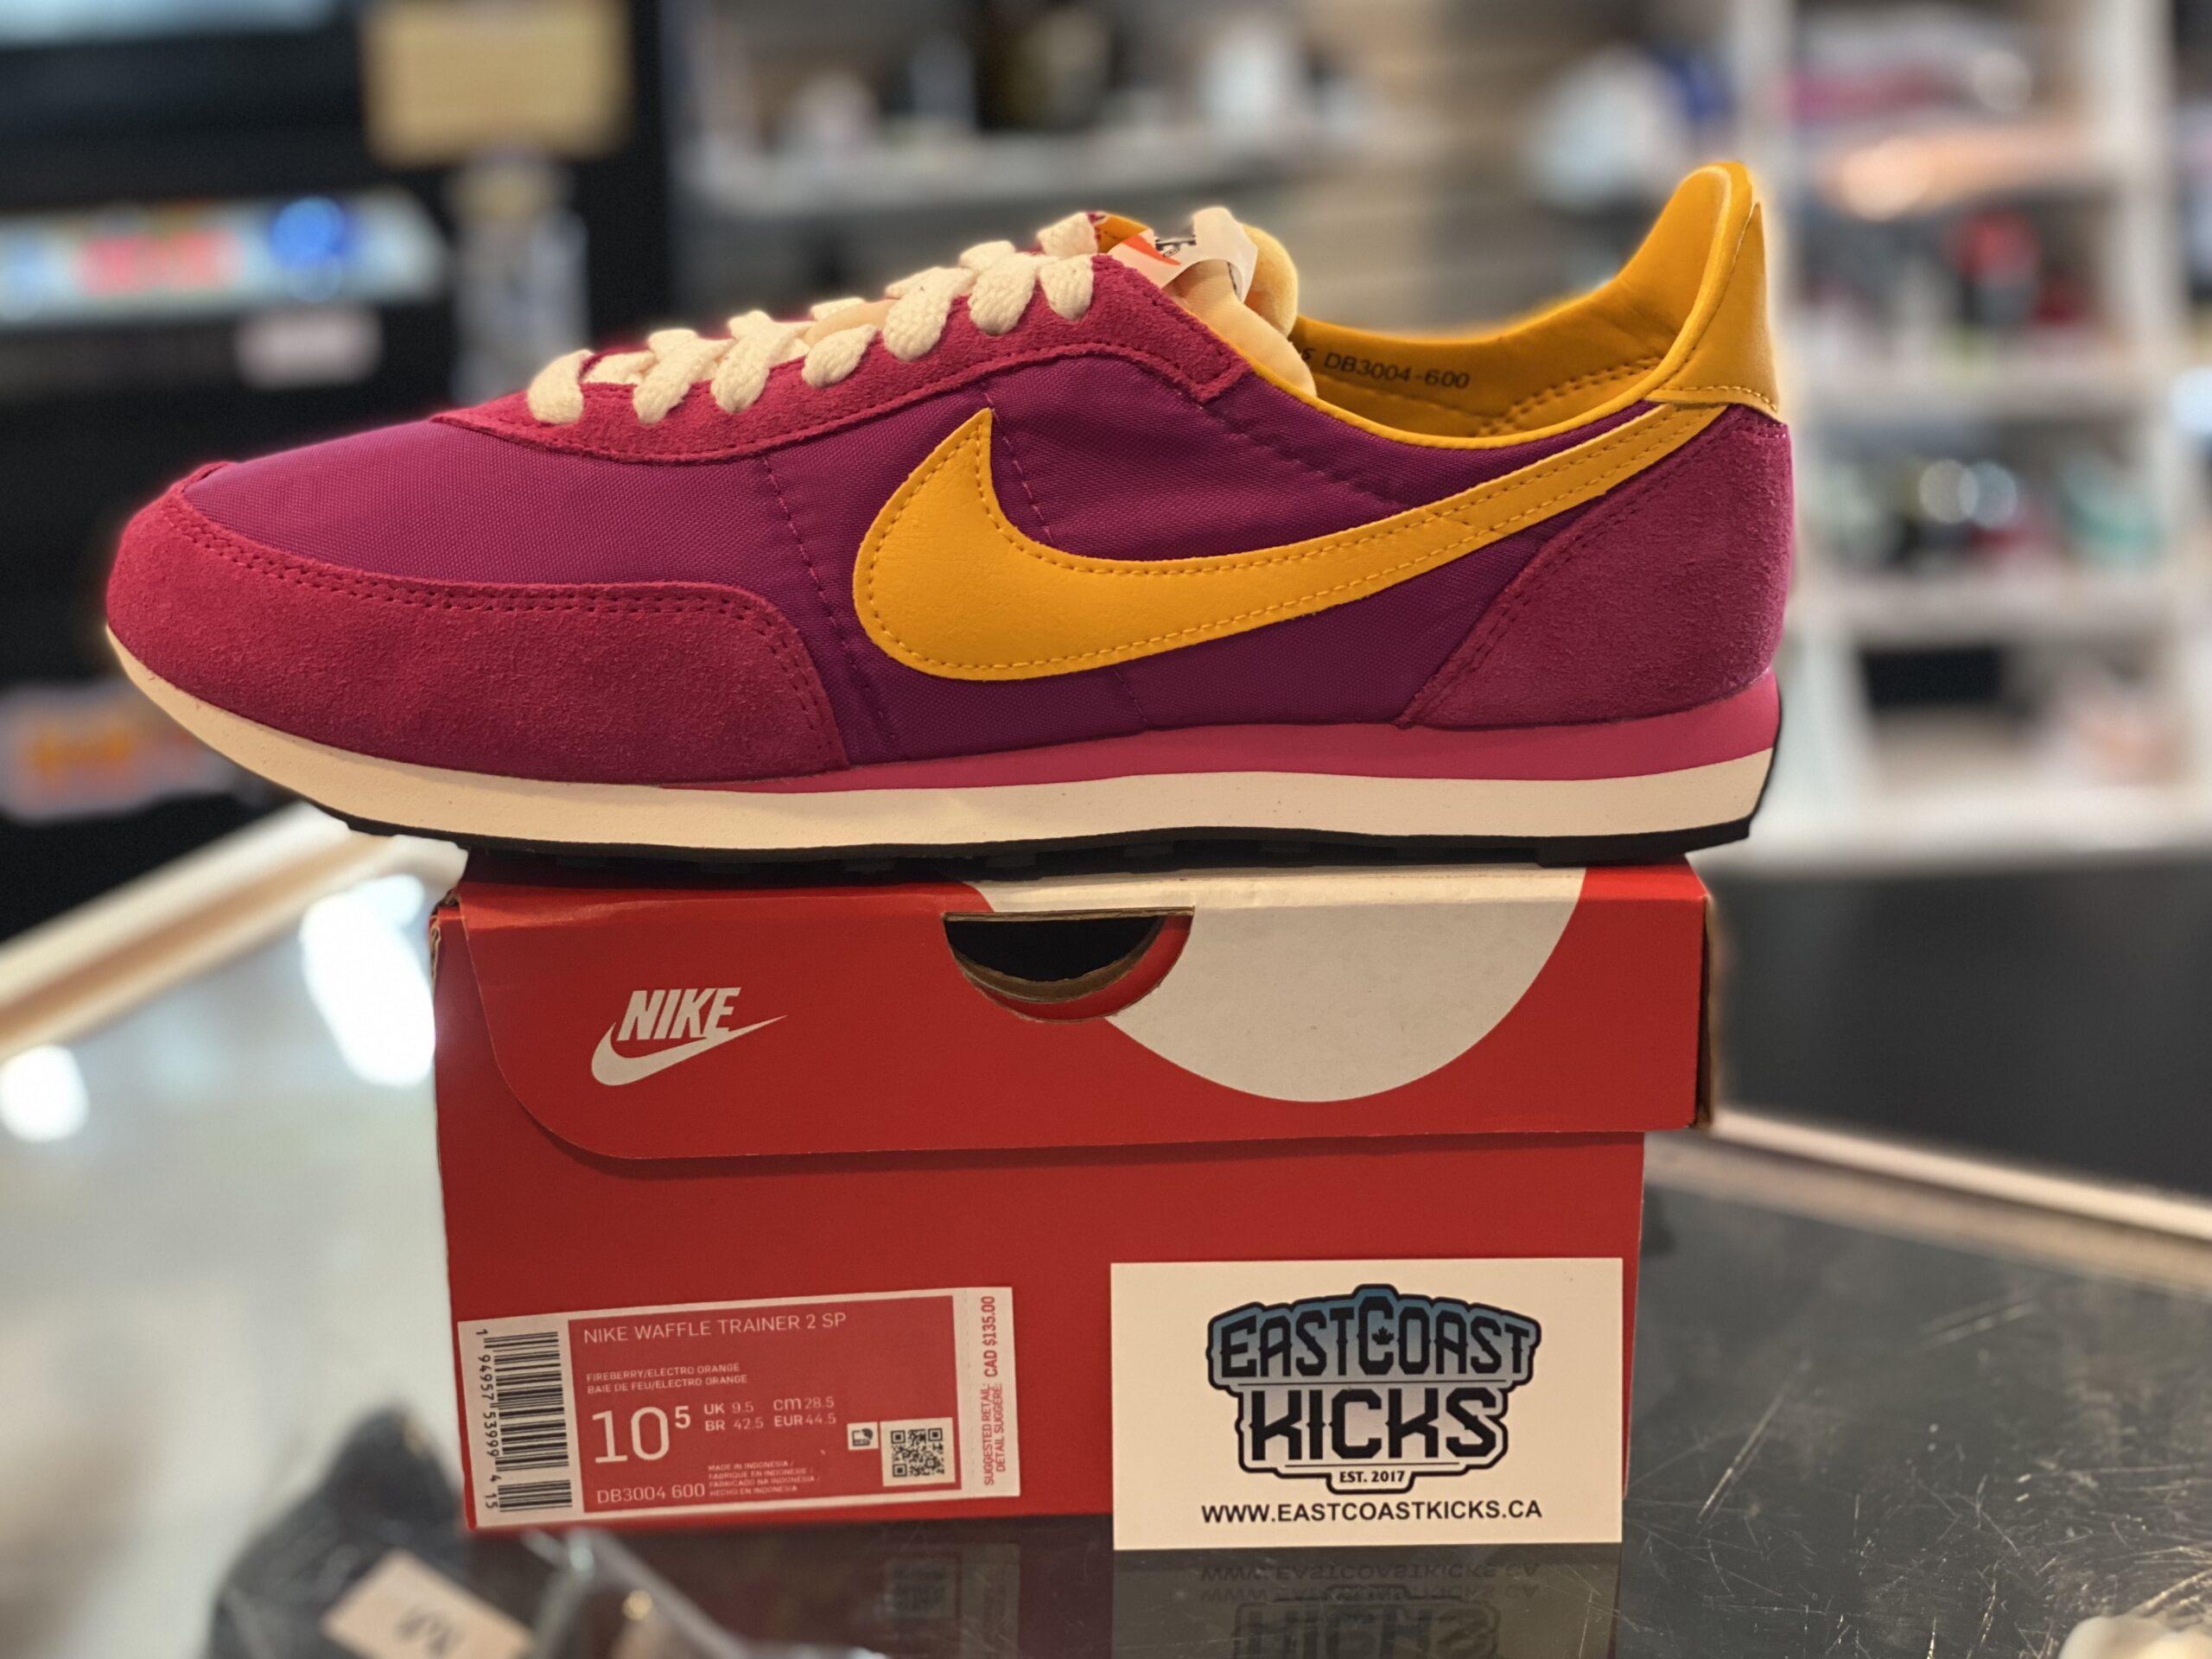 Nike Waffle Trainer 2 Fireberry Size 10.5